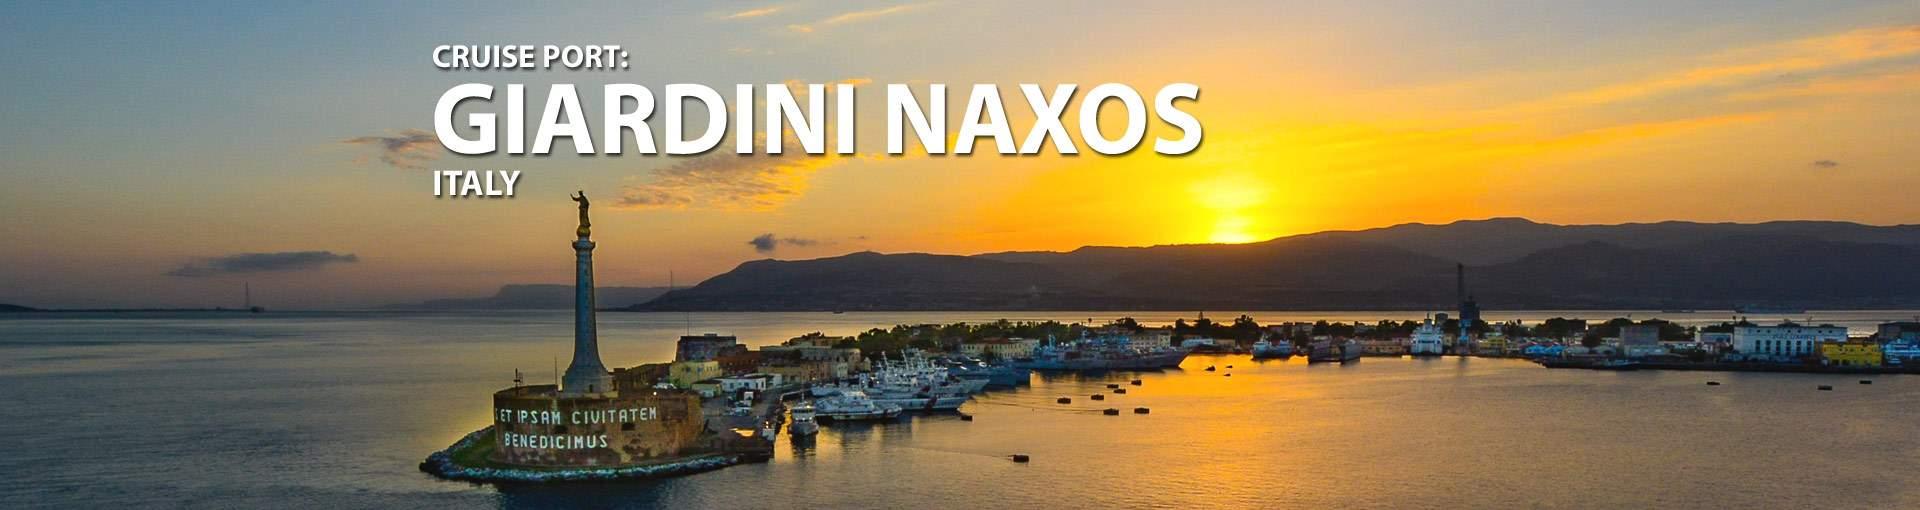 Naxos, Italy Cruise Port